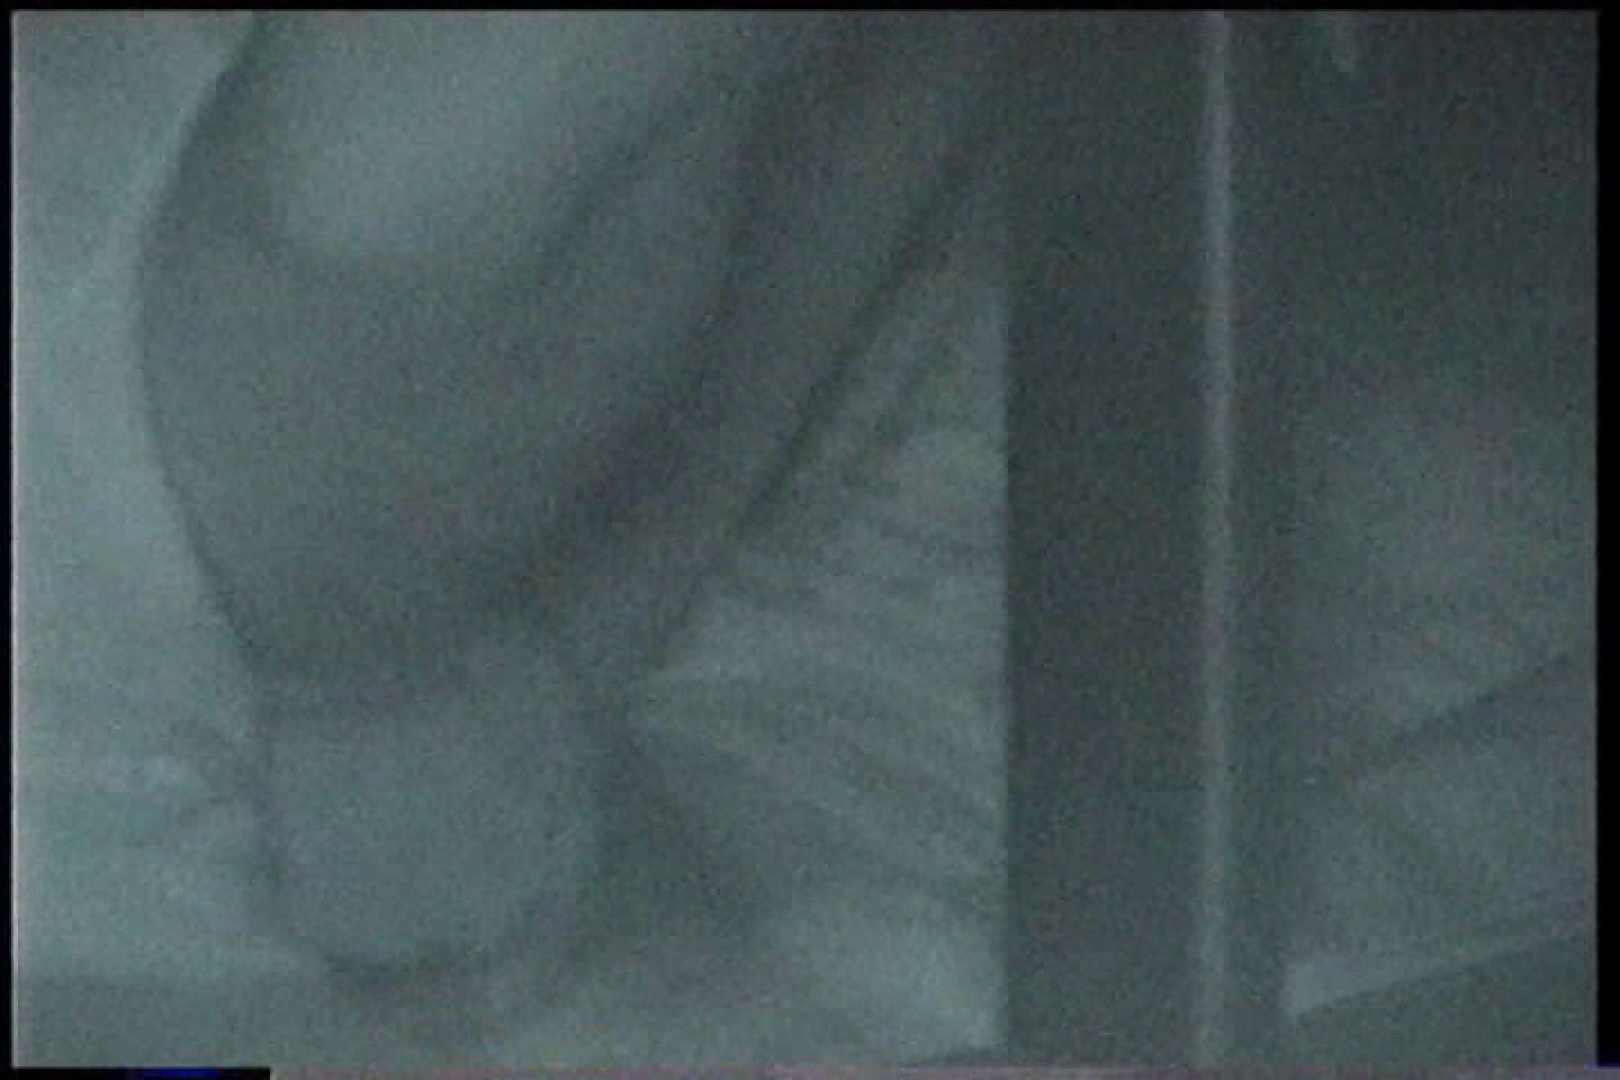 充血監督の深夜の運動会Vol.180 手マン 濡れ場動画紹介 89画像 3